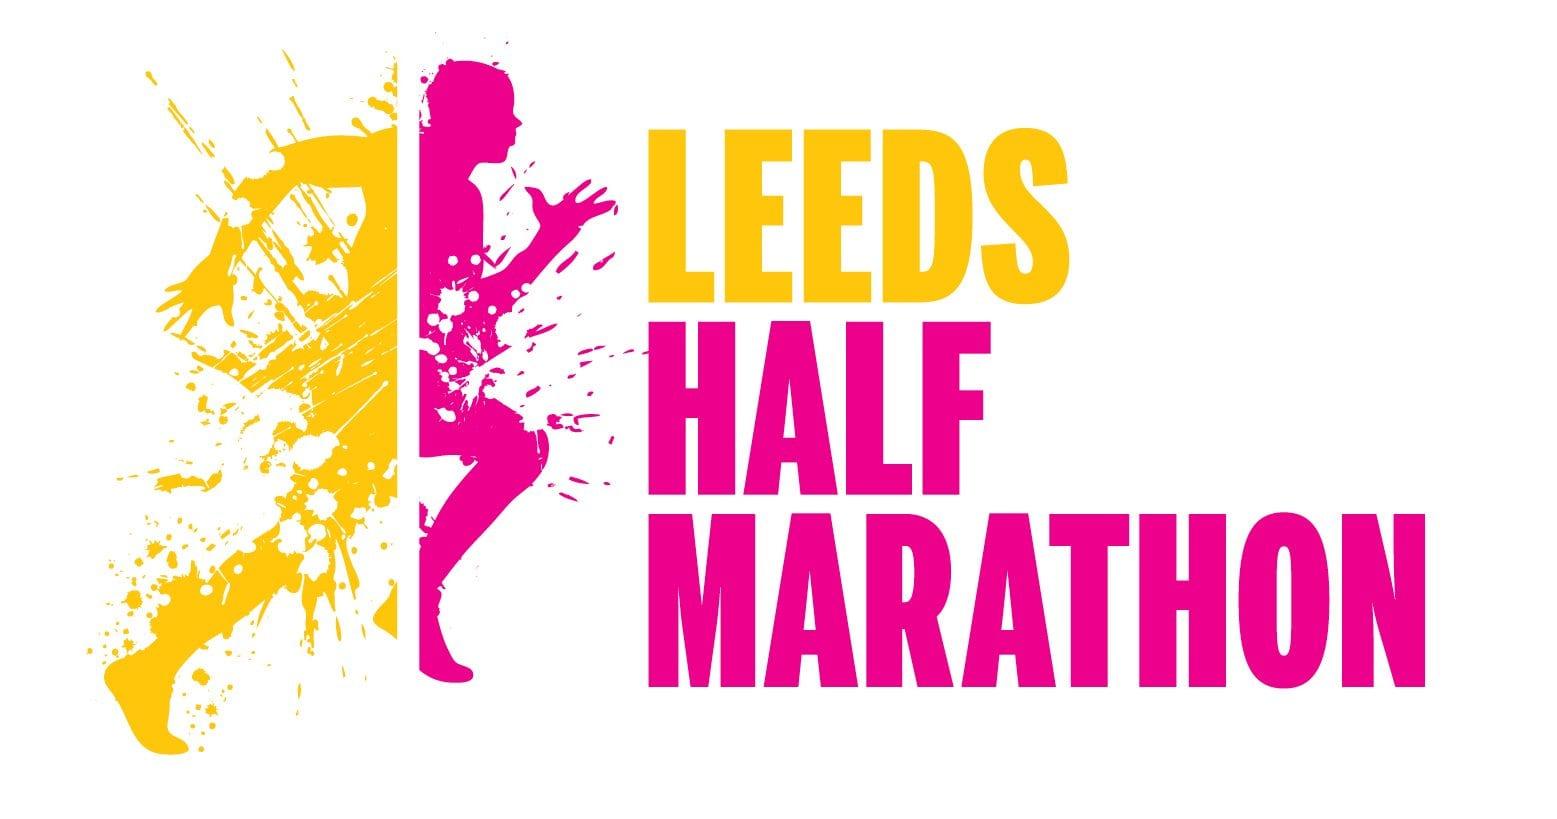 Leeds Half Marathon 2020